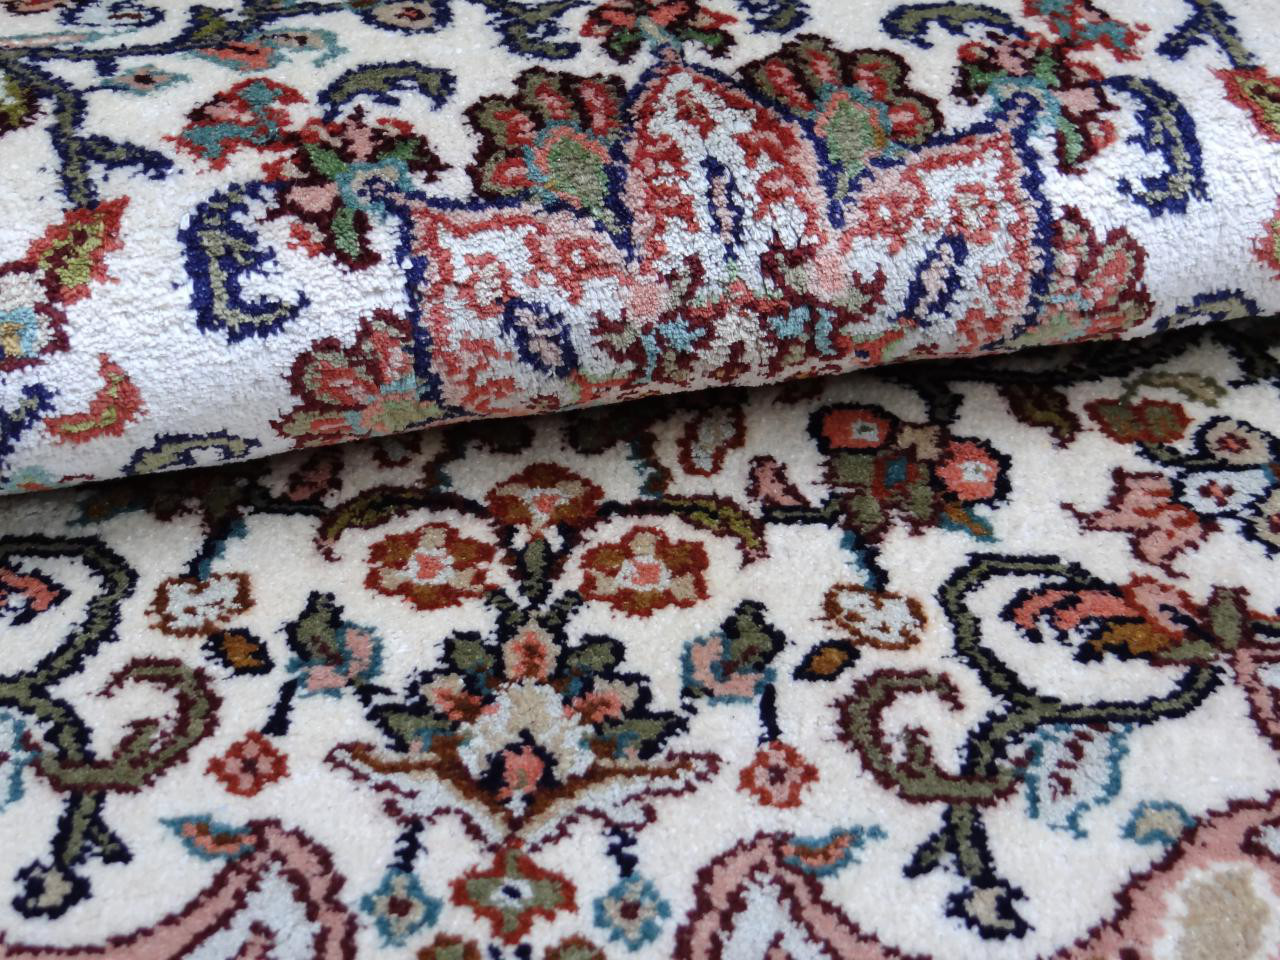 srinagar soie fin tapis prestigieux n 2336 99x65cm. Black Bedroom Furniture Sets. Home Design Ideas